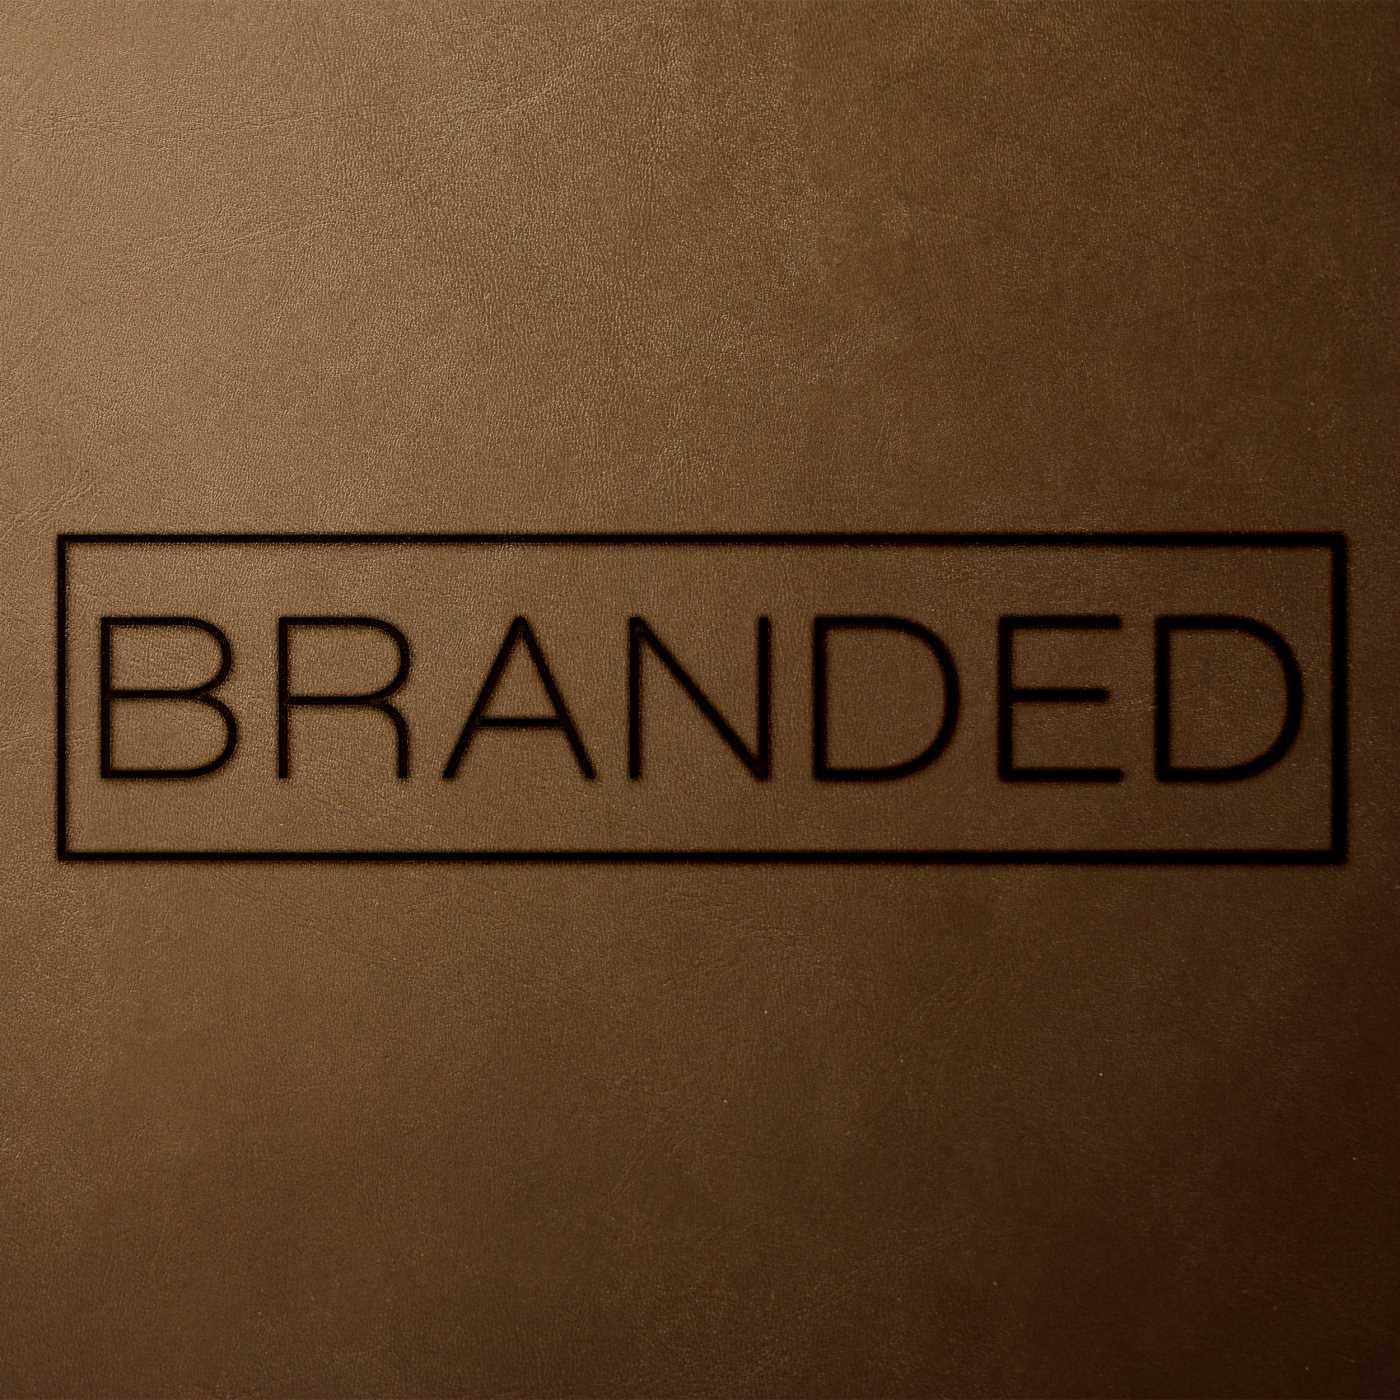 ALL MAVEN's Branded podcast